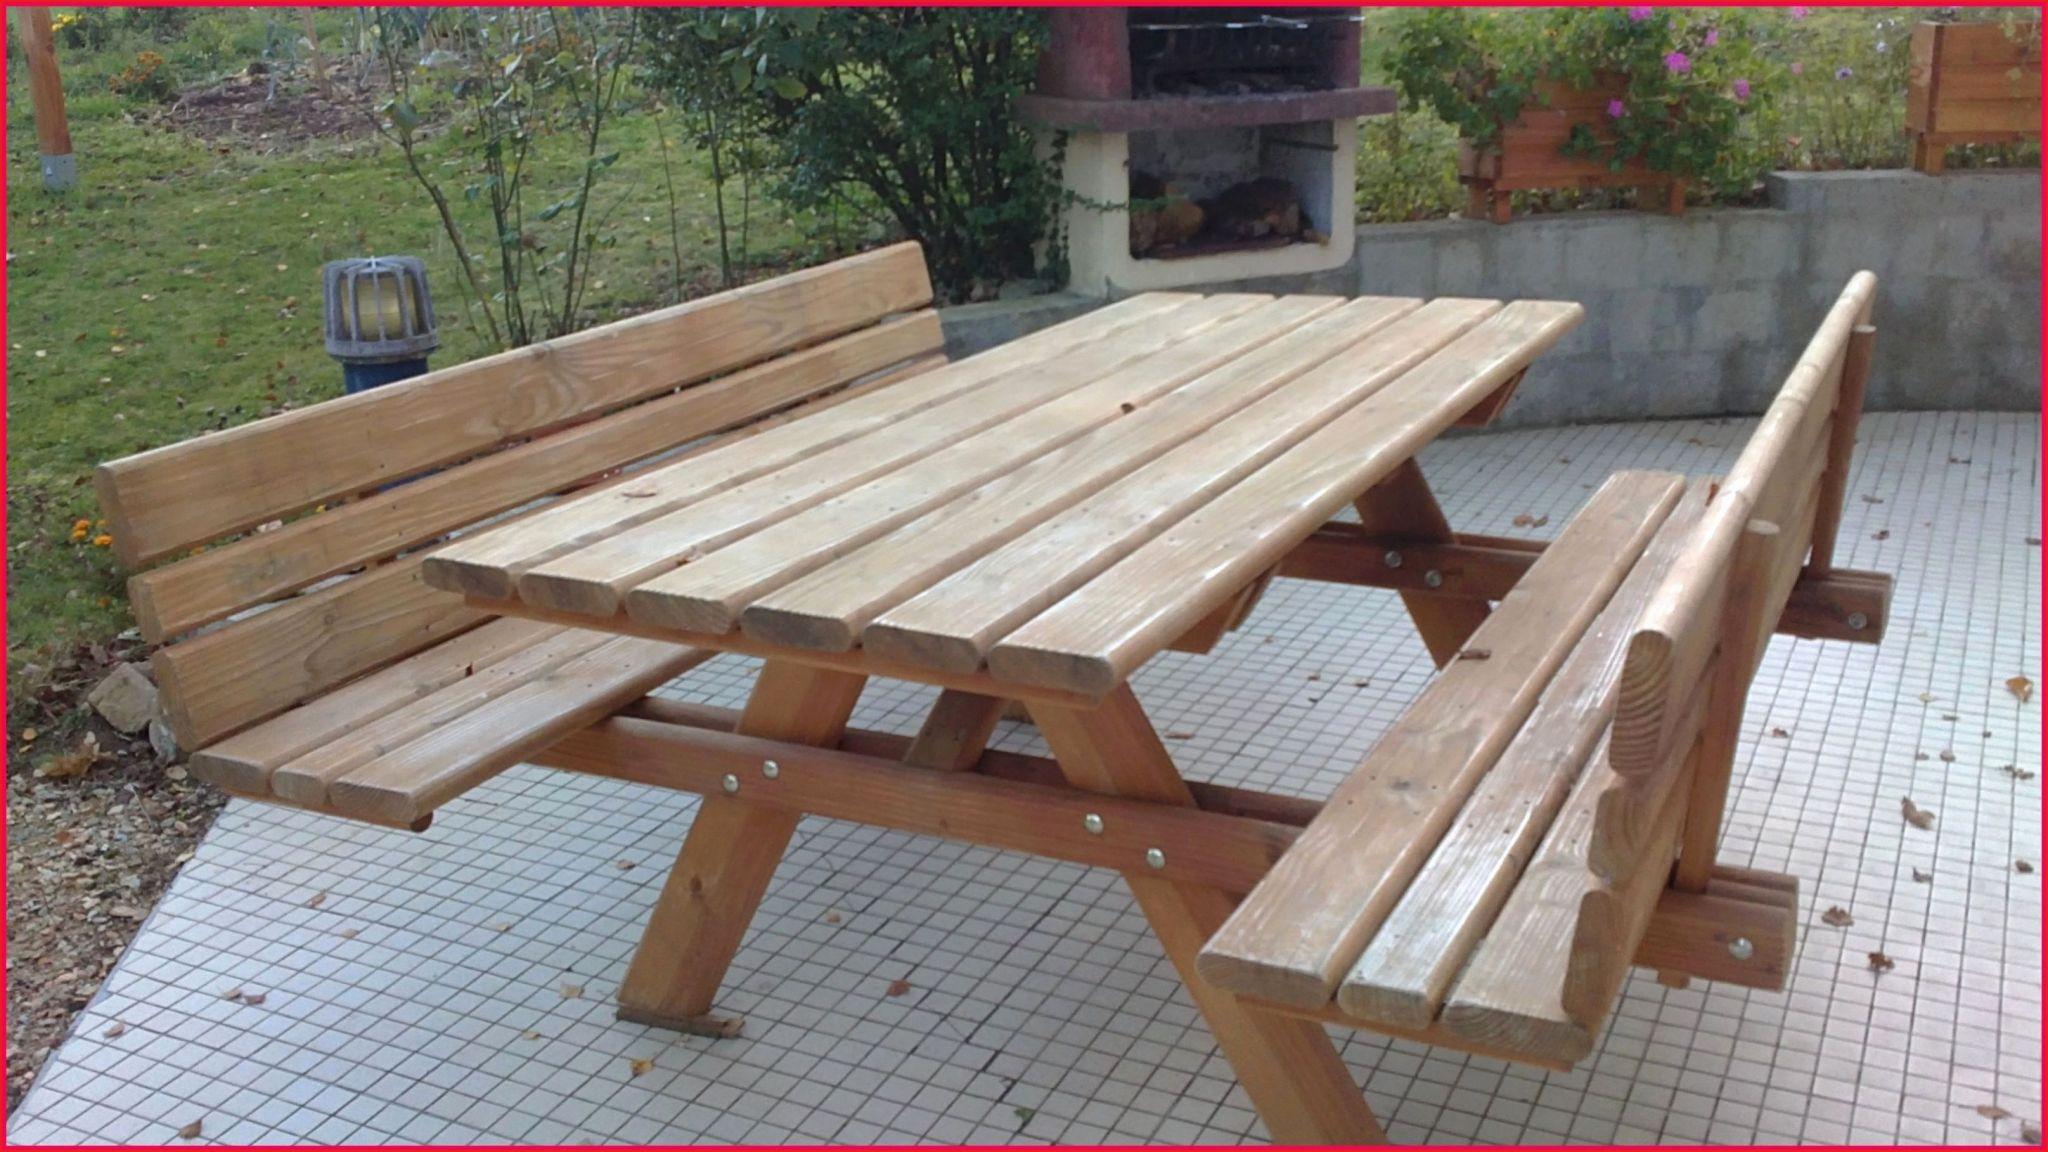 banc pour jardin salon de jardin contemporain ou banc jardin bois frais banc bois of banc pour jardin